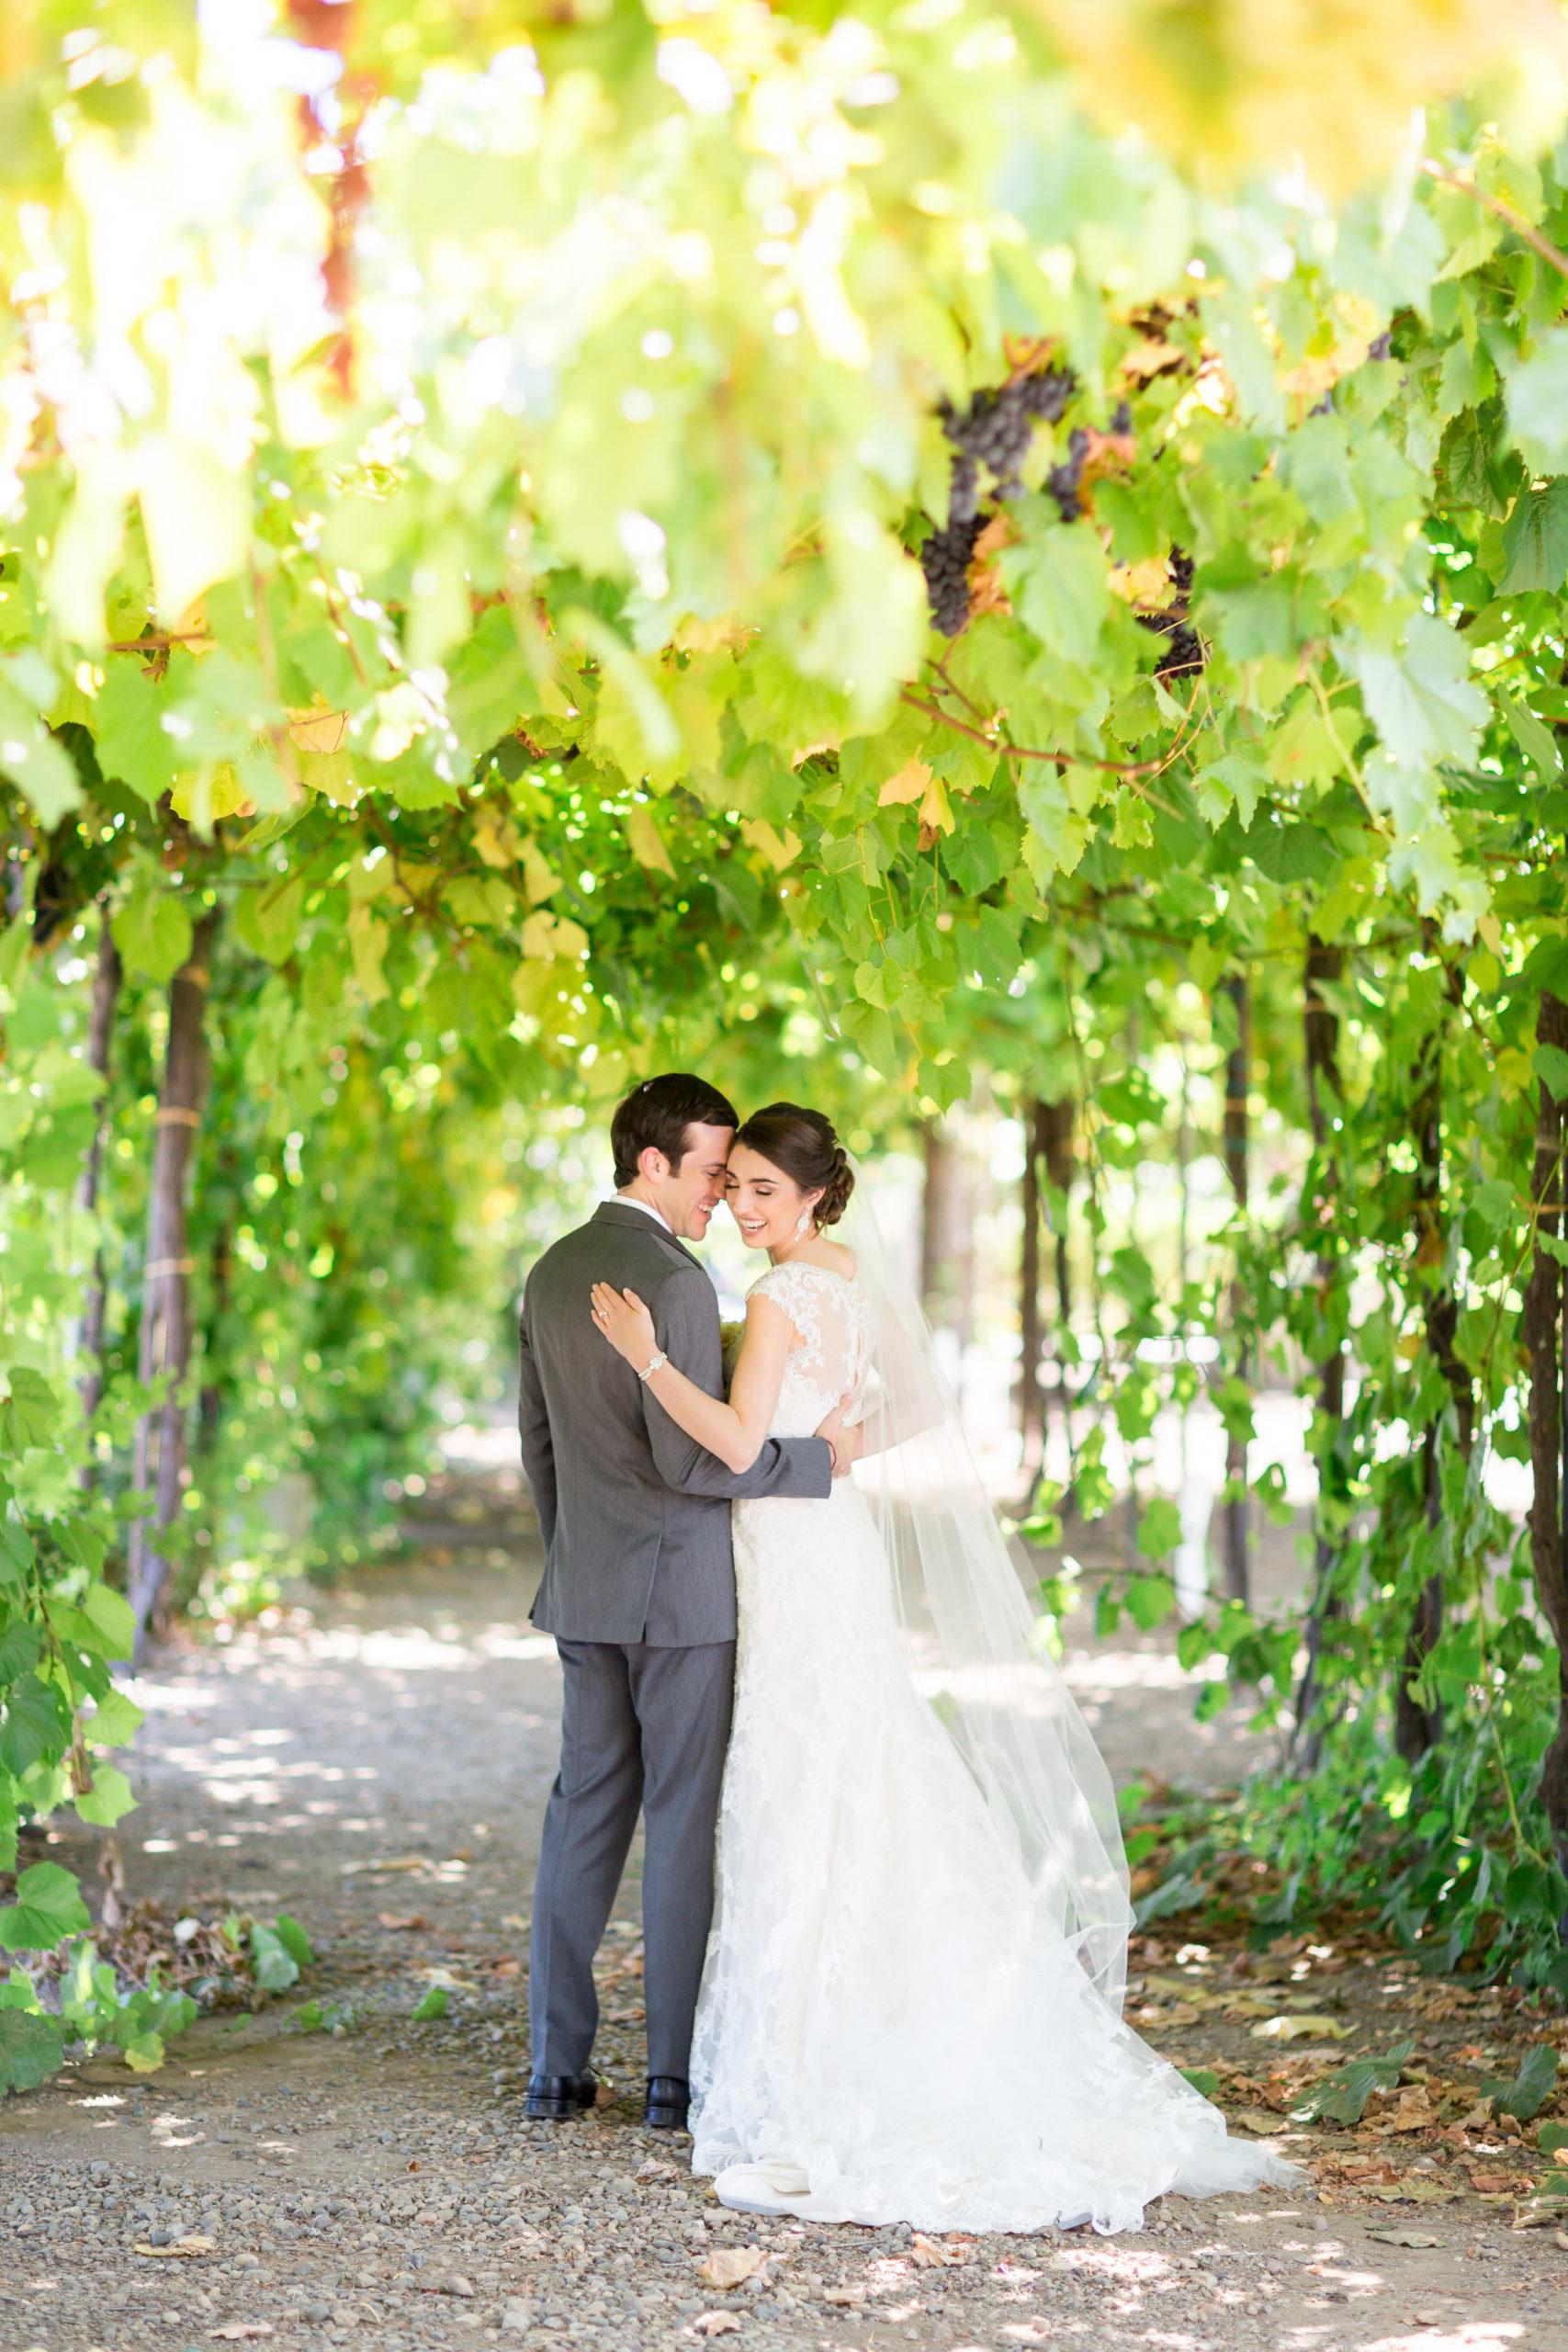 Trentadue-Winery-Wedding-Photographer-1-1707x2560.jpg